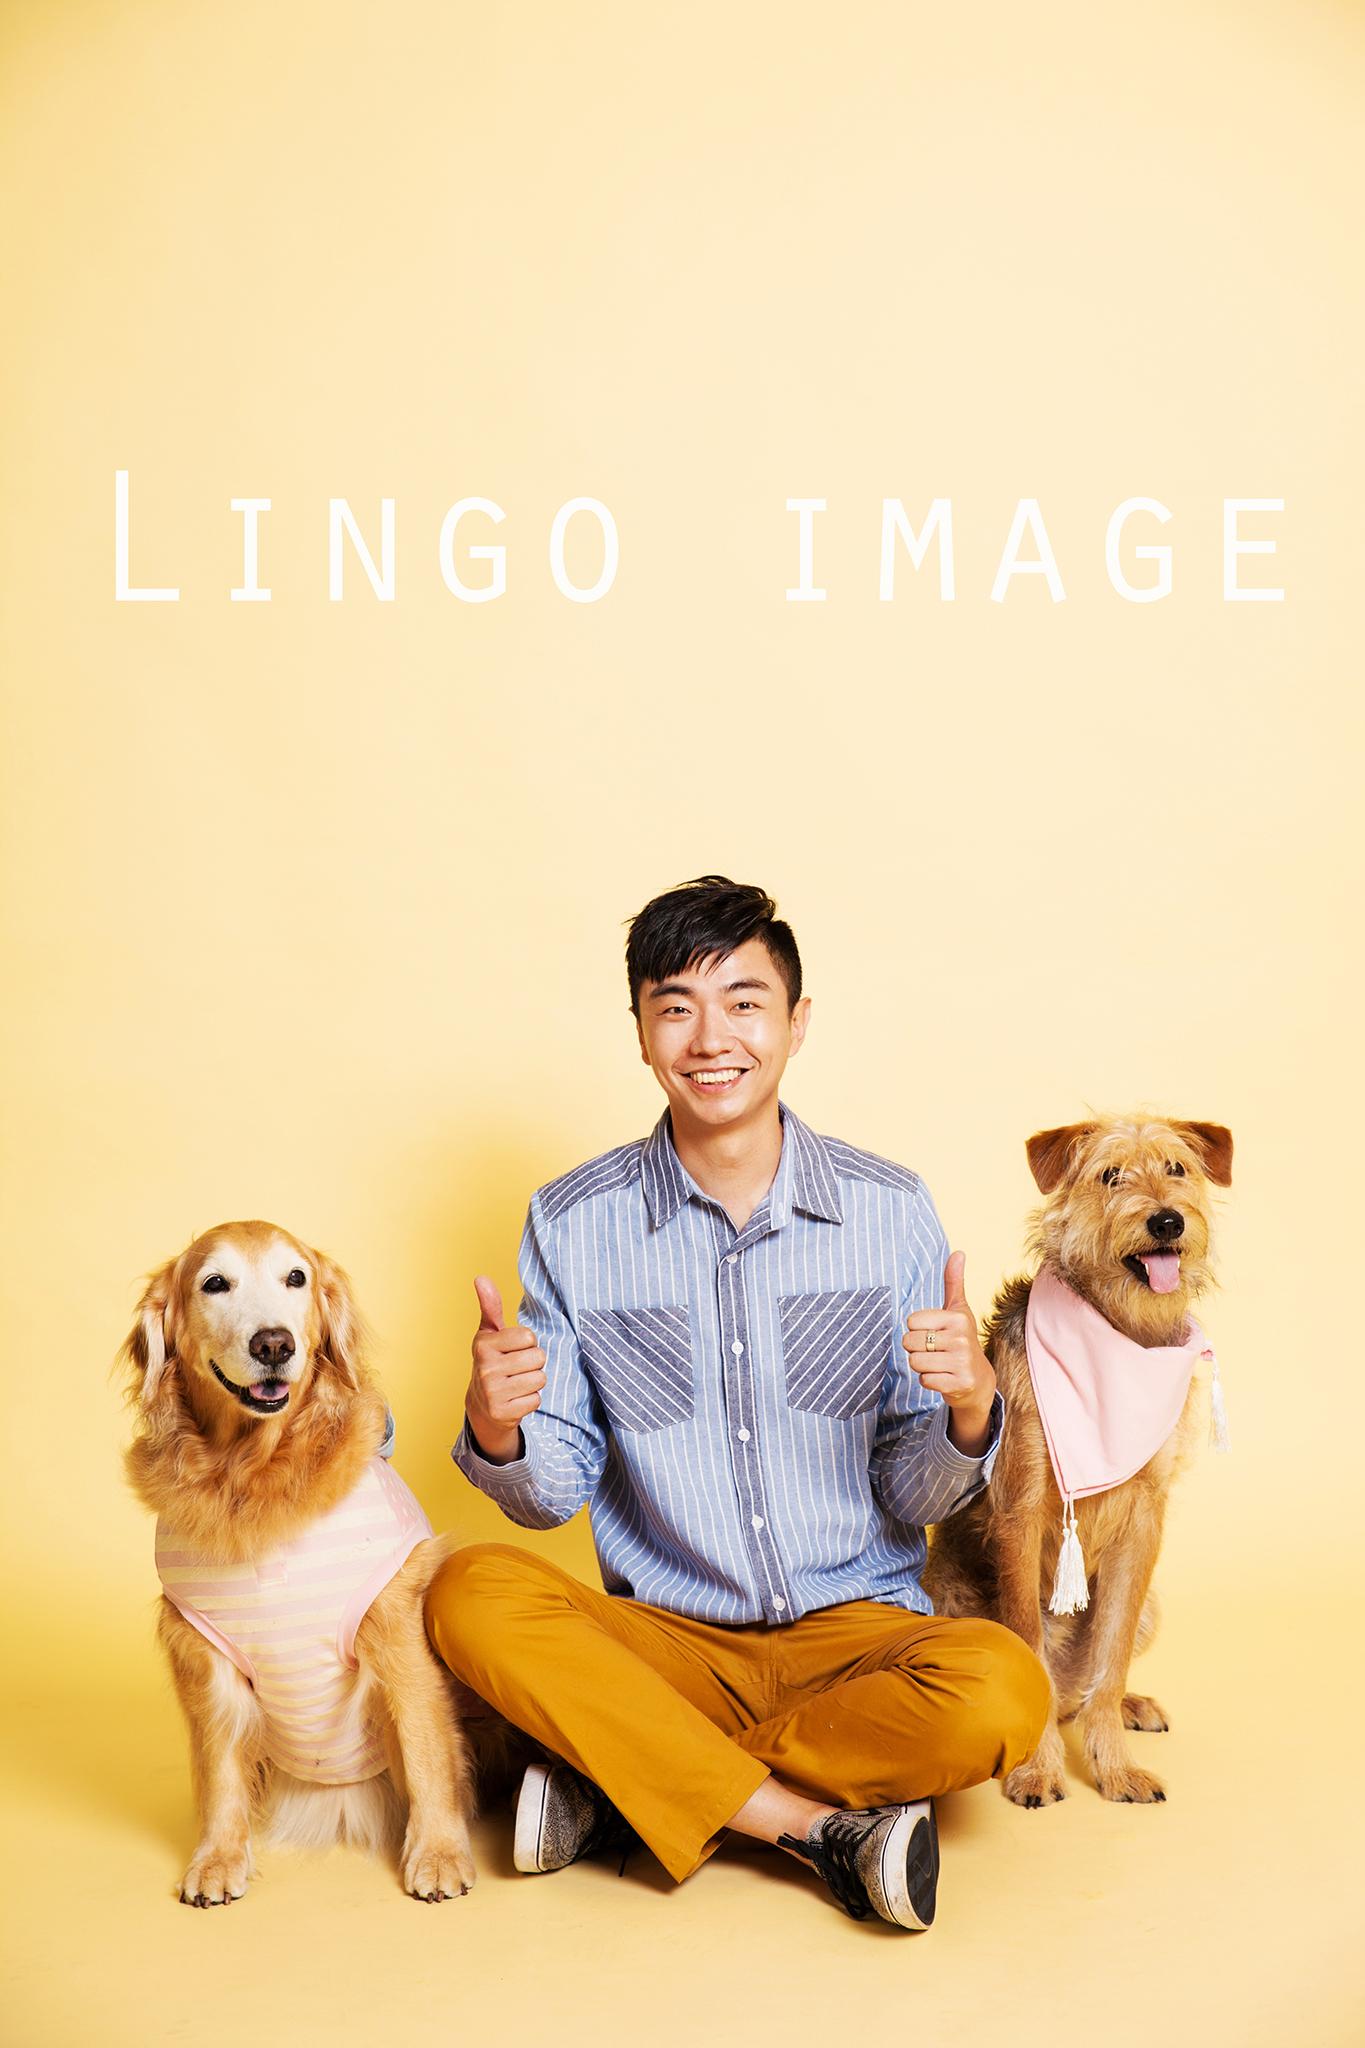 Lingo image_代言14